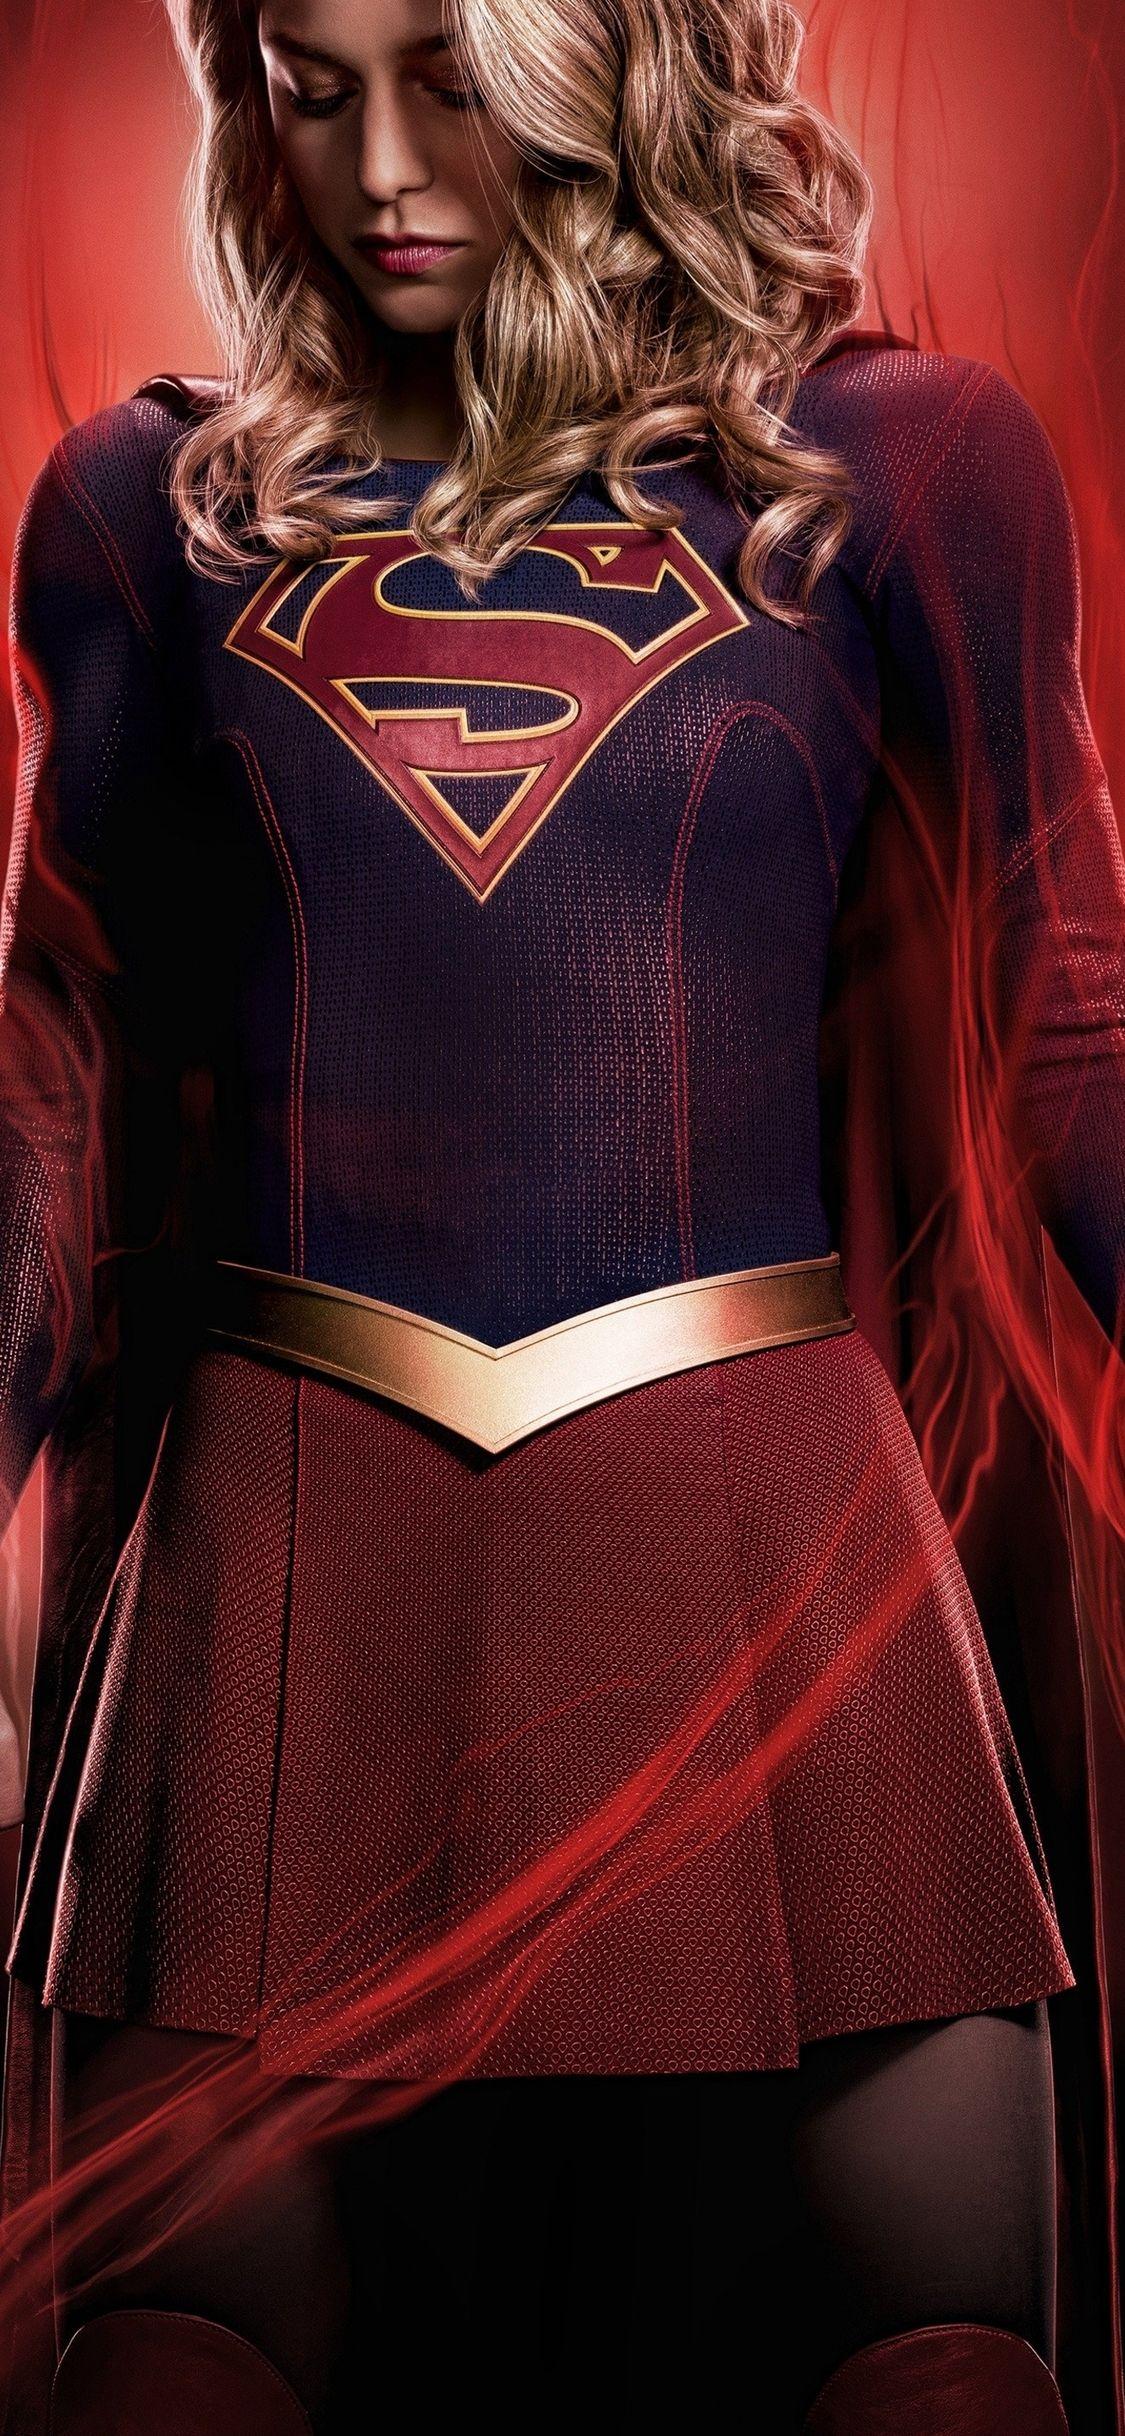 1125x2436 supergirl season 4 4k iphone xsiphone 10iphone